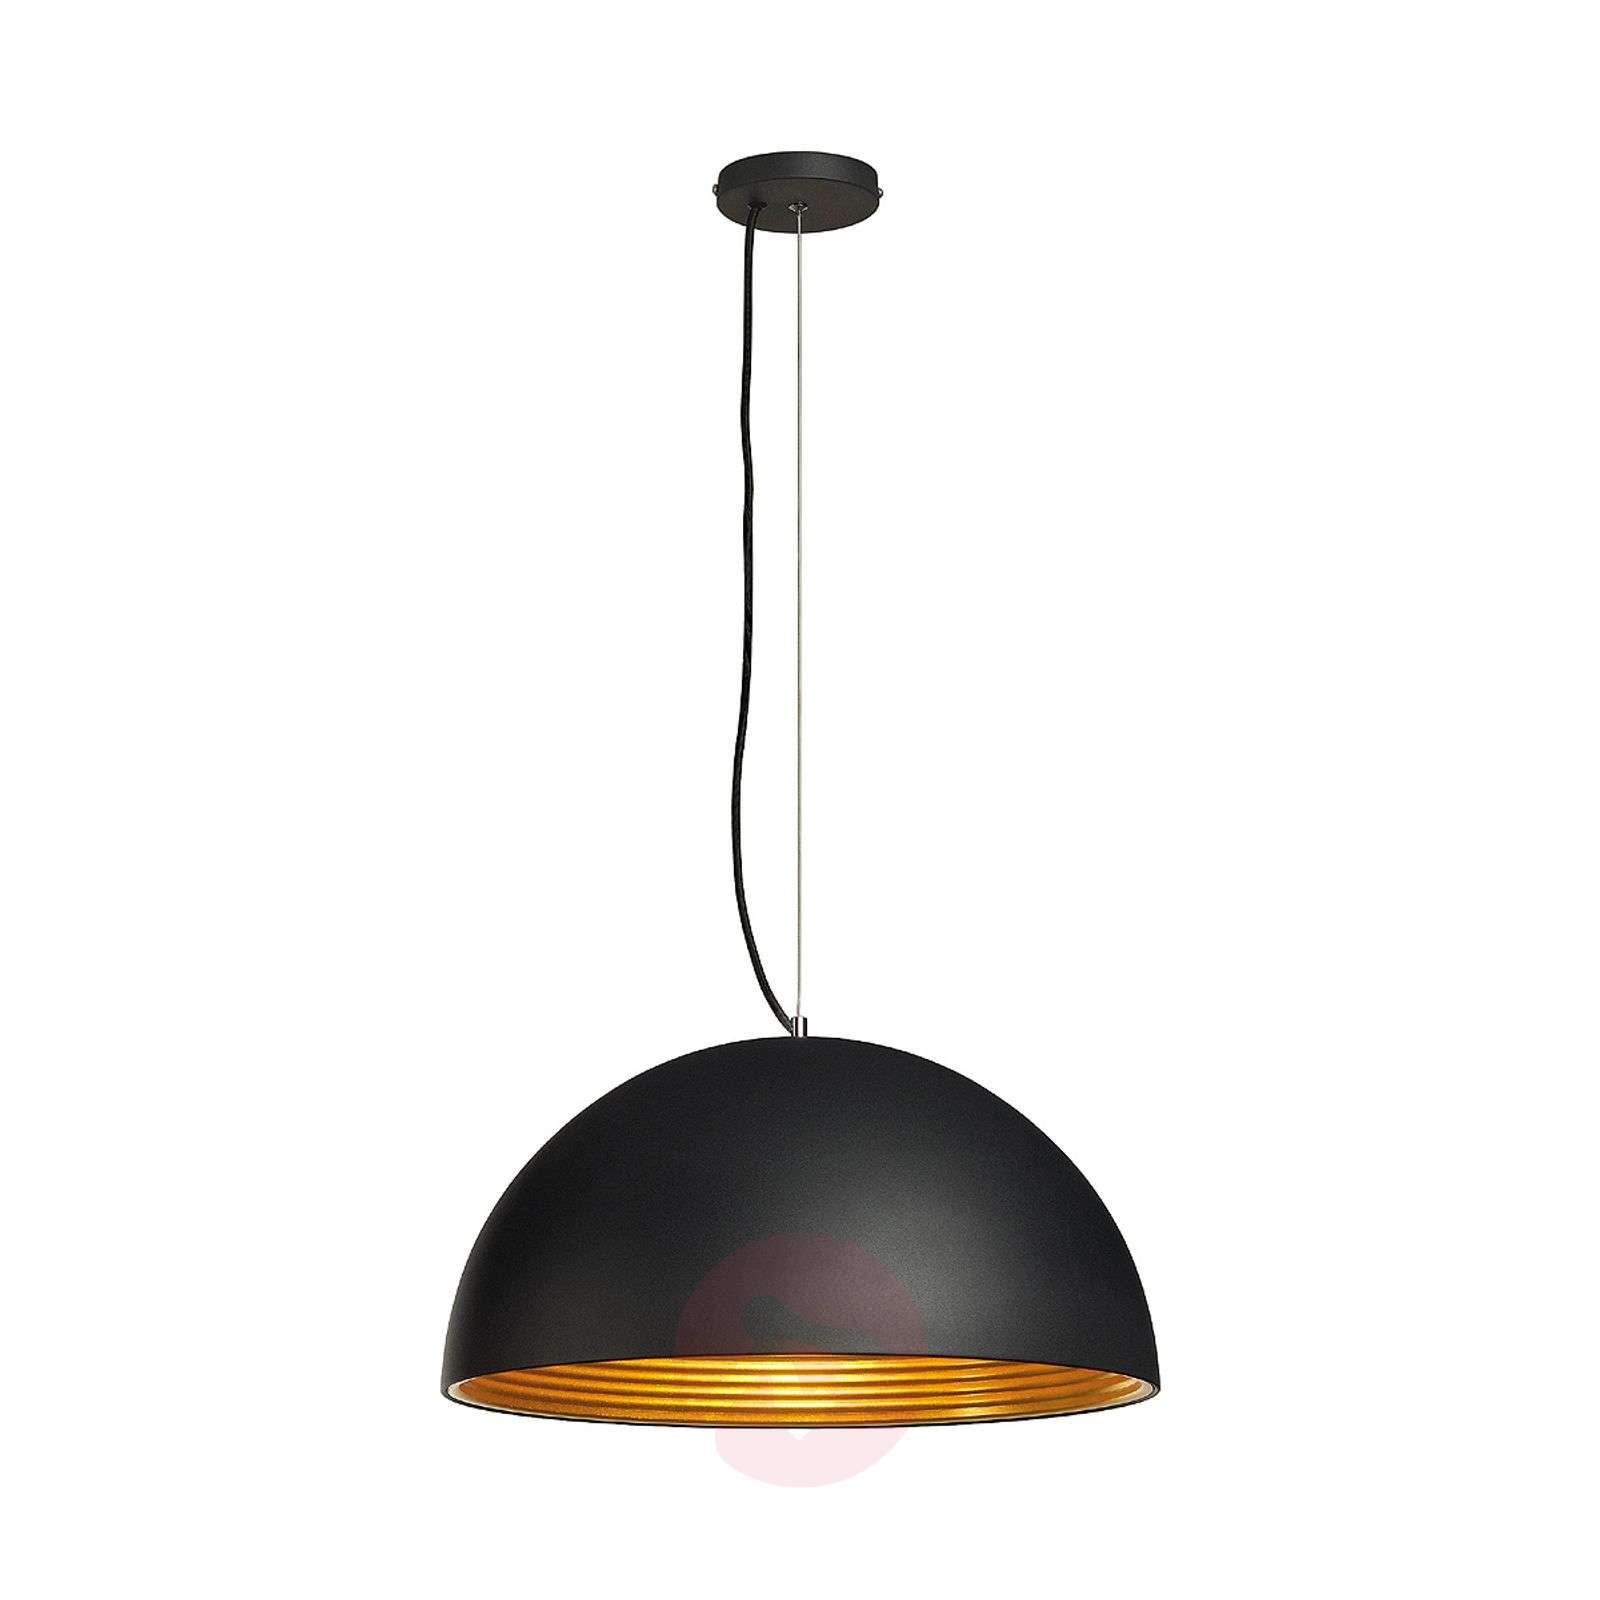 Forchini M Pendant Lamp, 50 cm, Black/Gold-5504428-01